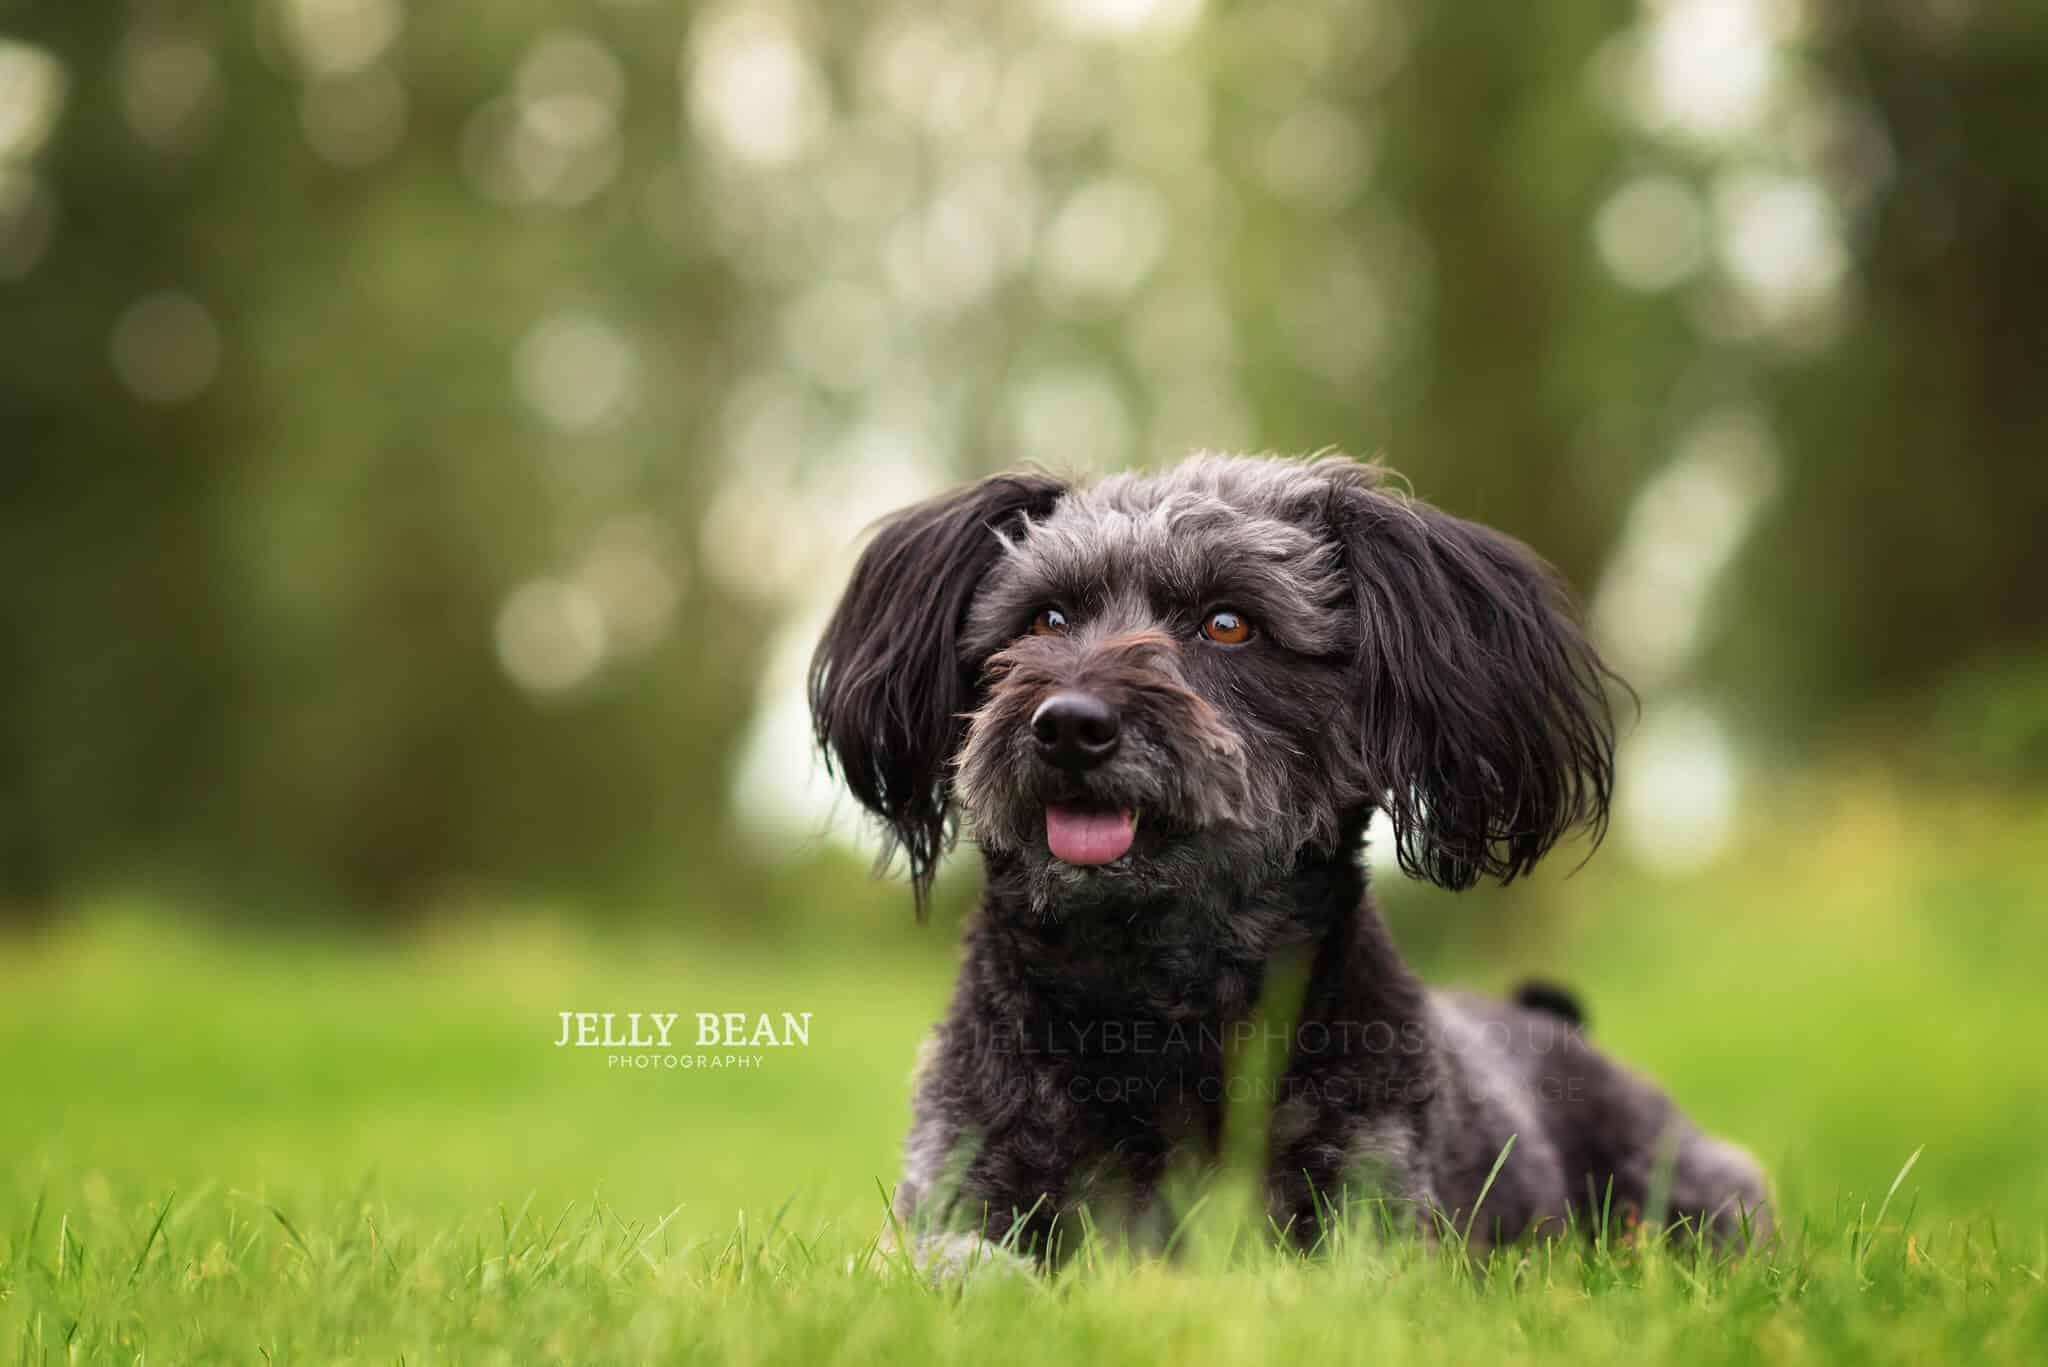 small dog lying on grass